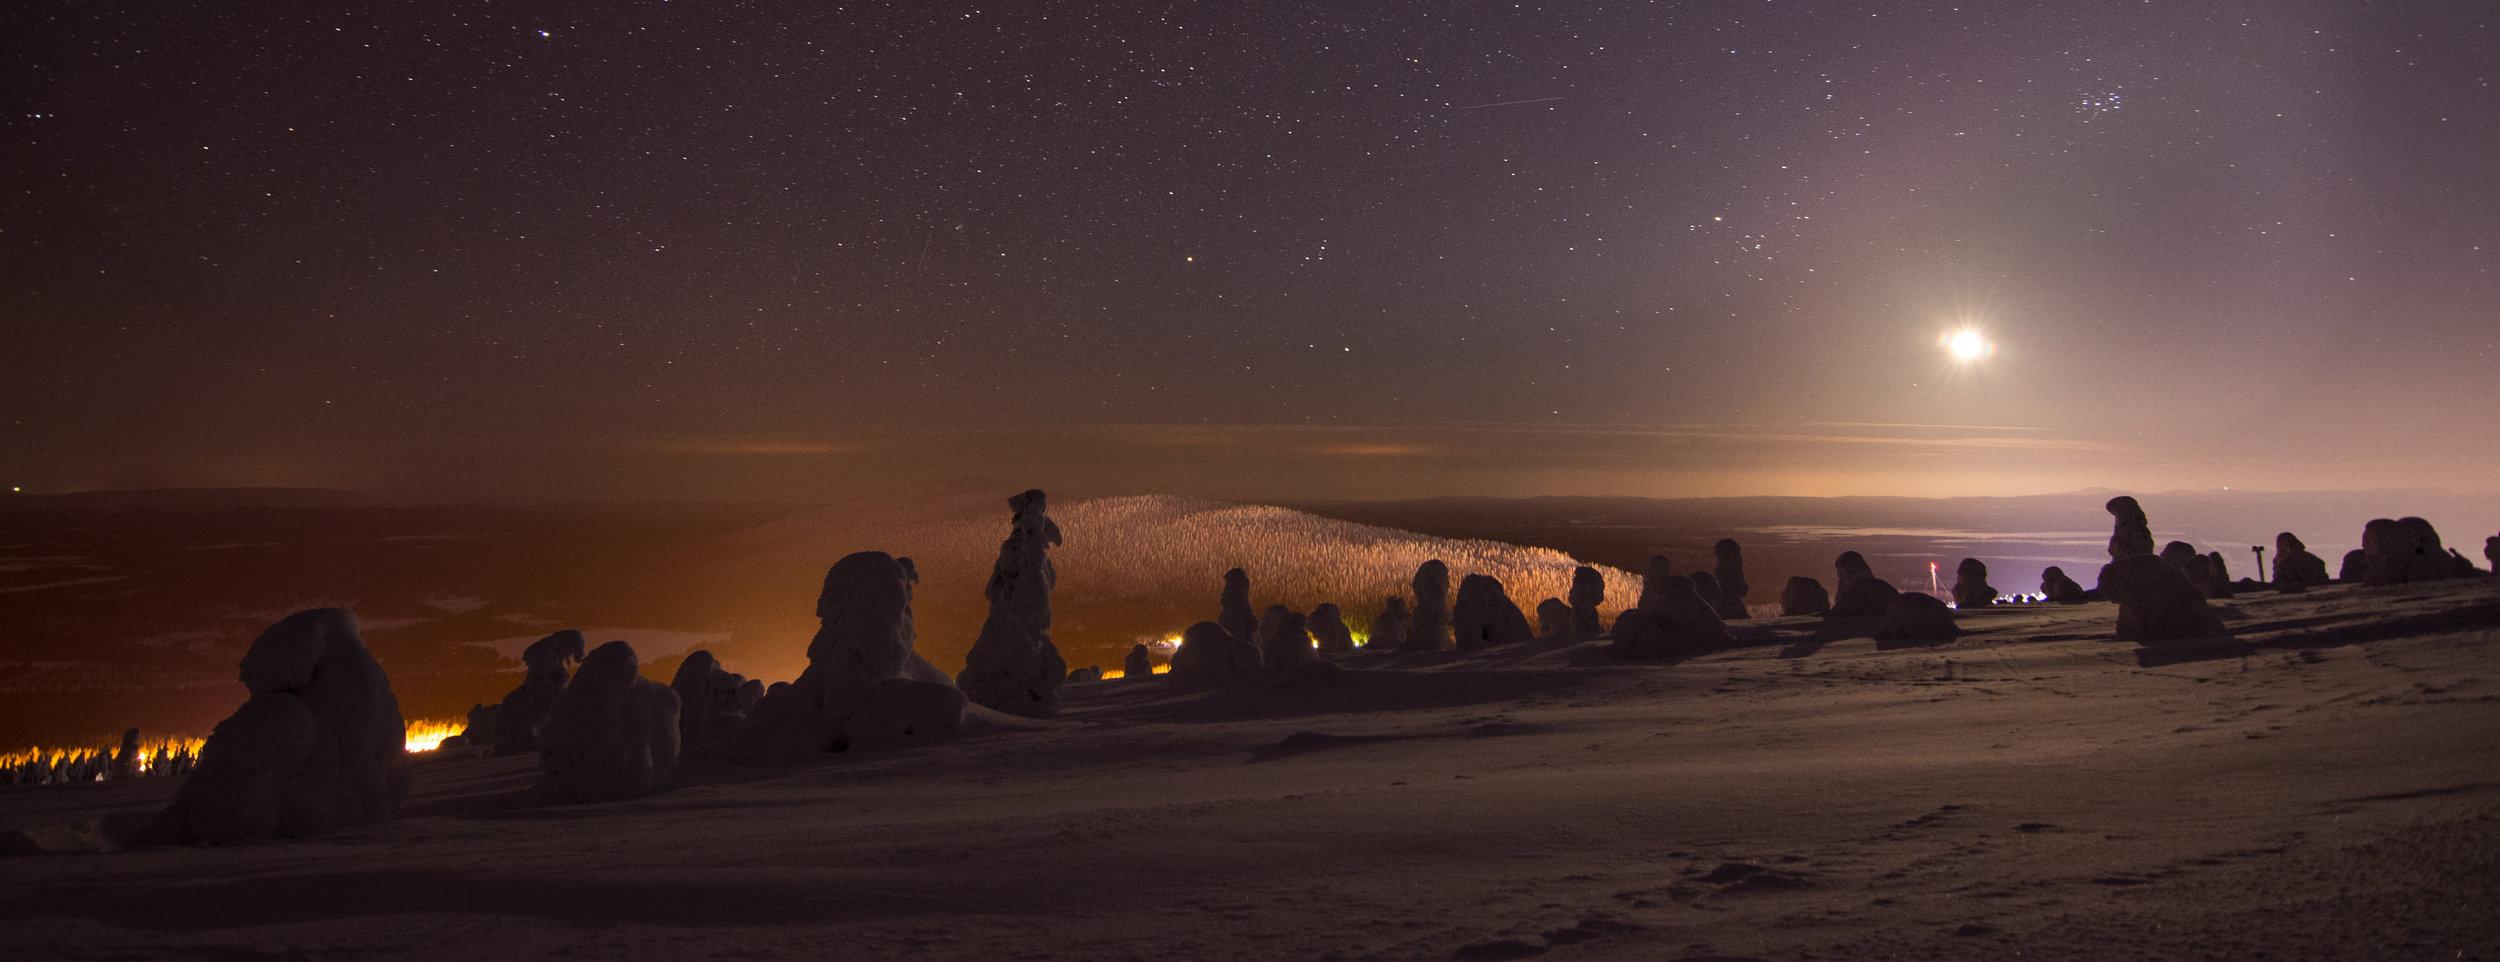 Lapland Moonlight